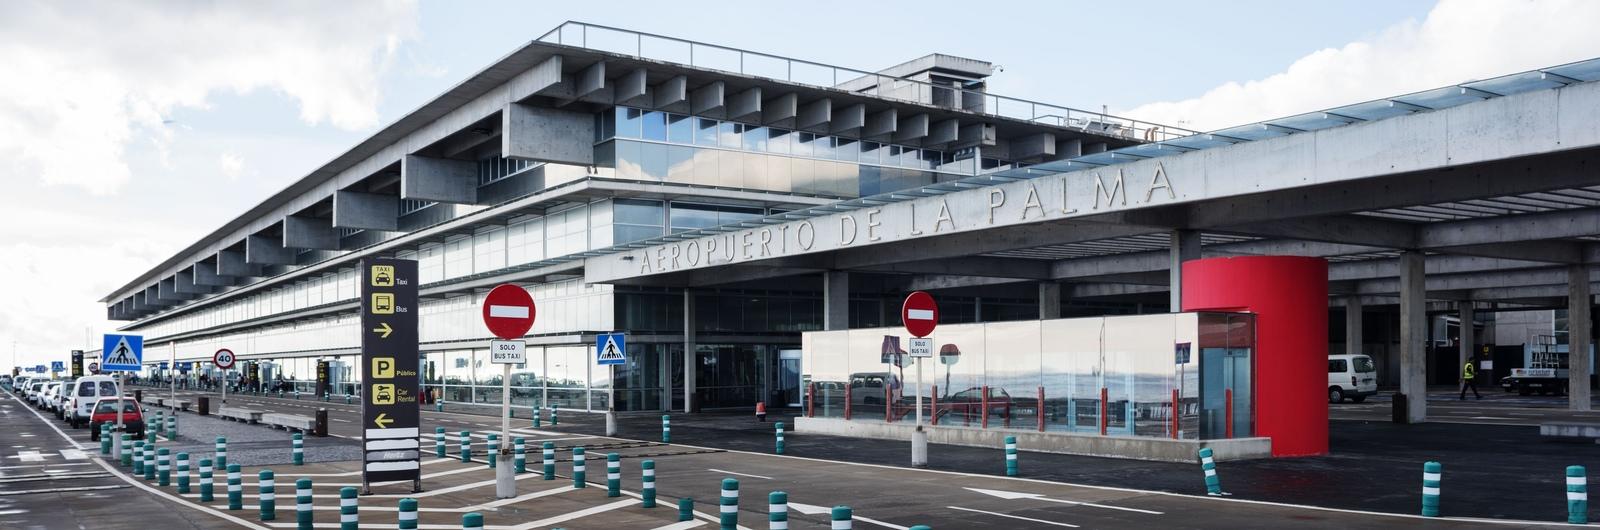 la palma airport header